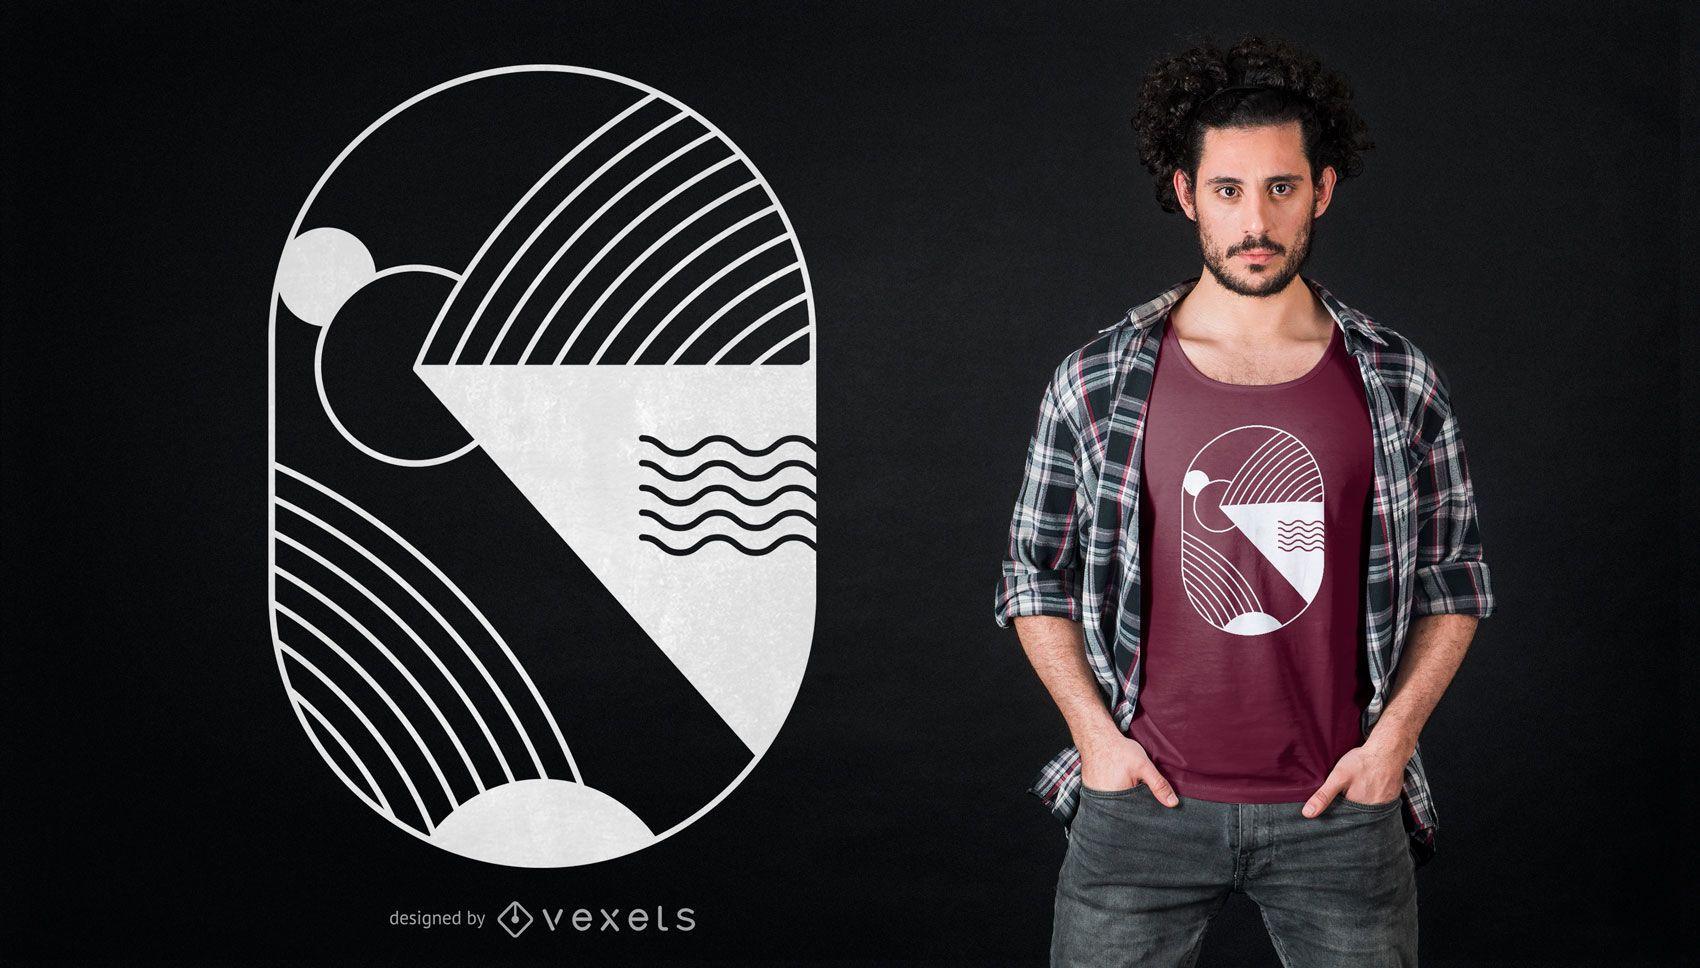 Minimales abstraktes T-Shirt Design